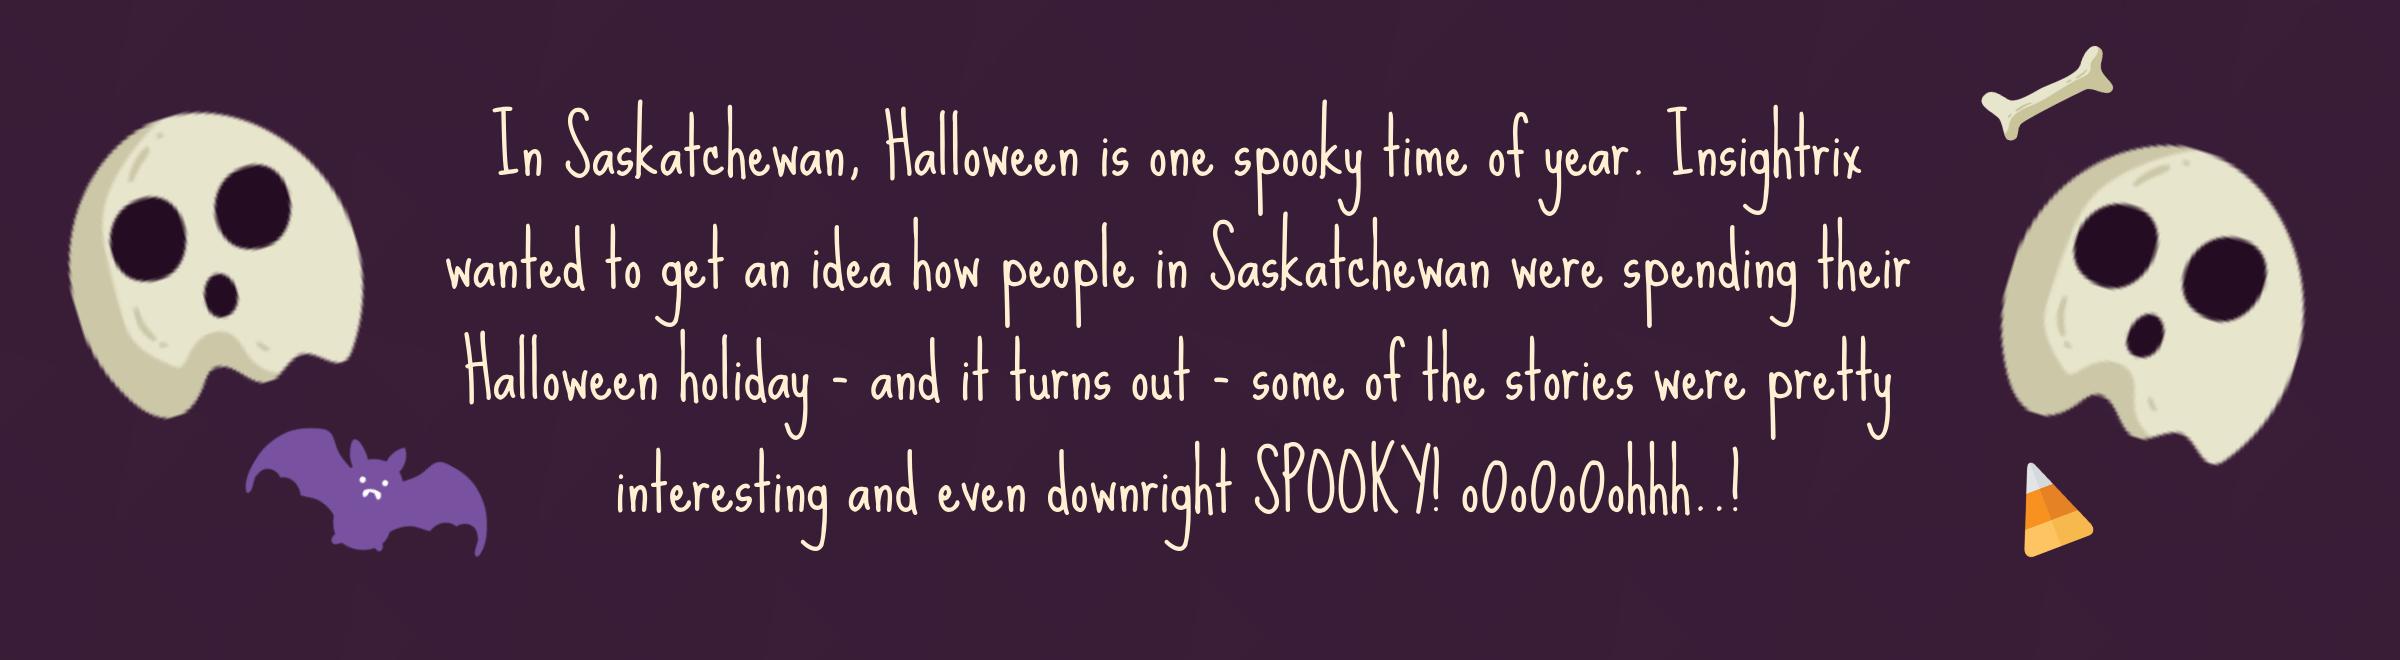 Insightrix Halloween Market-Research Saskatchewan SK Sask